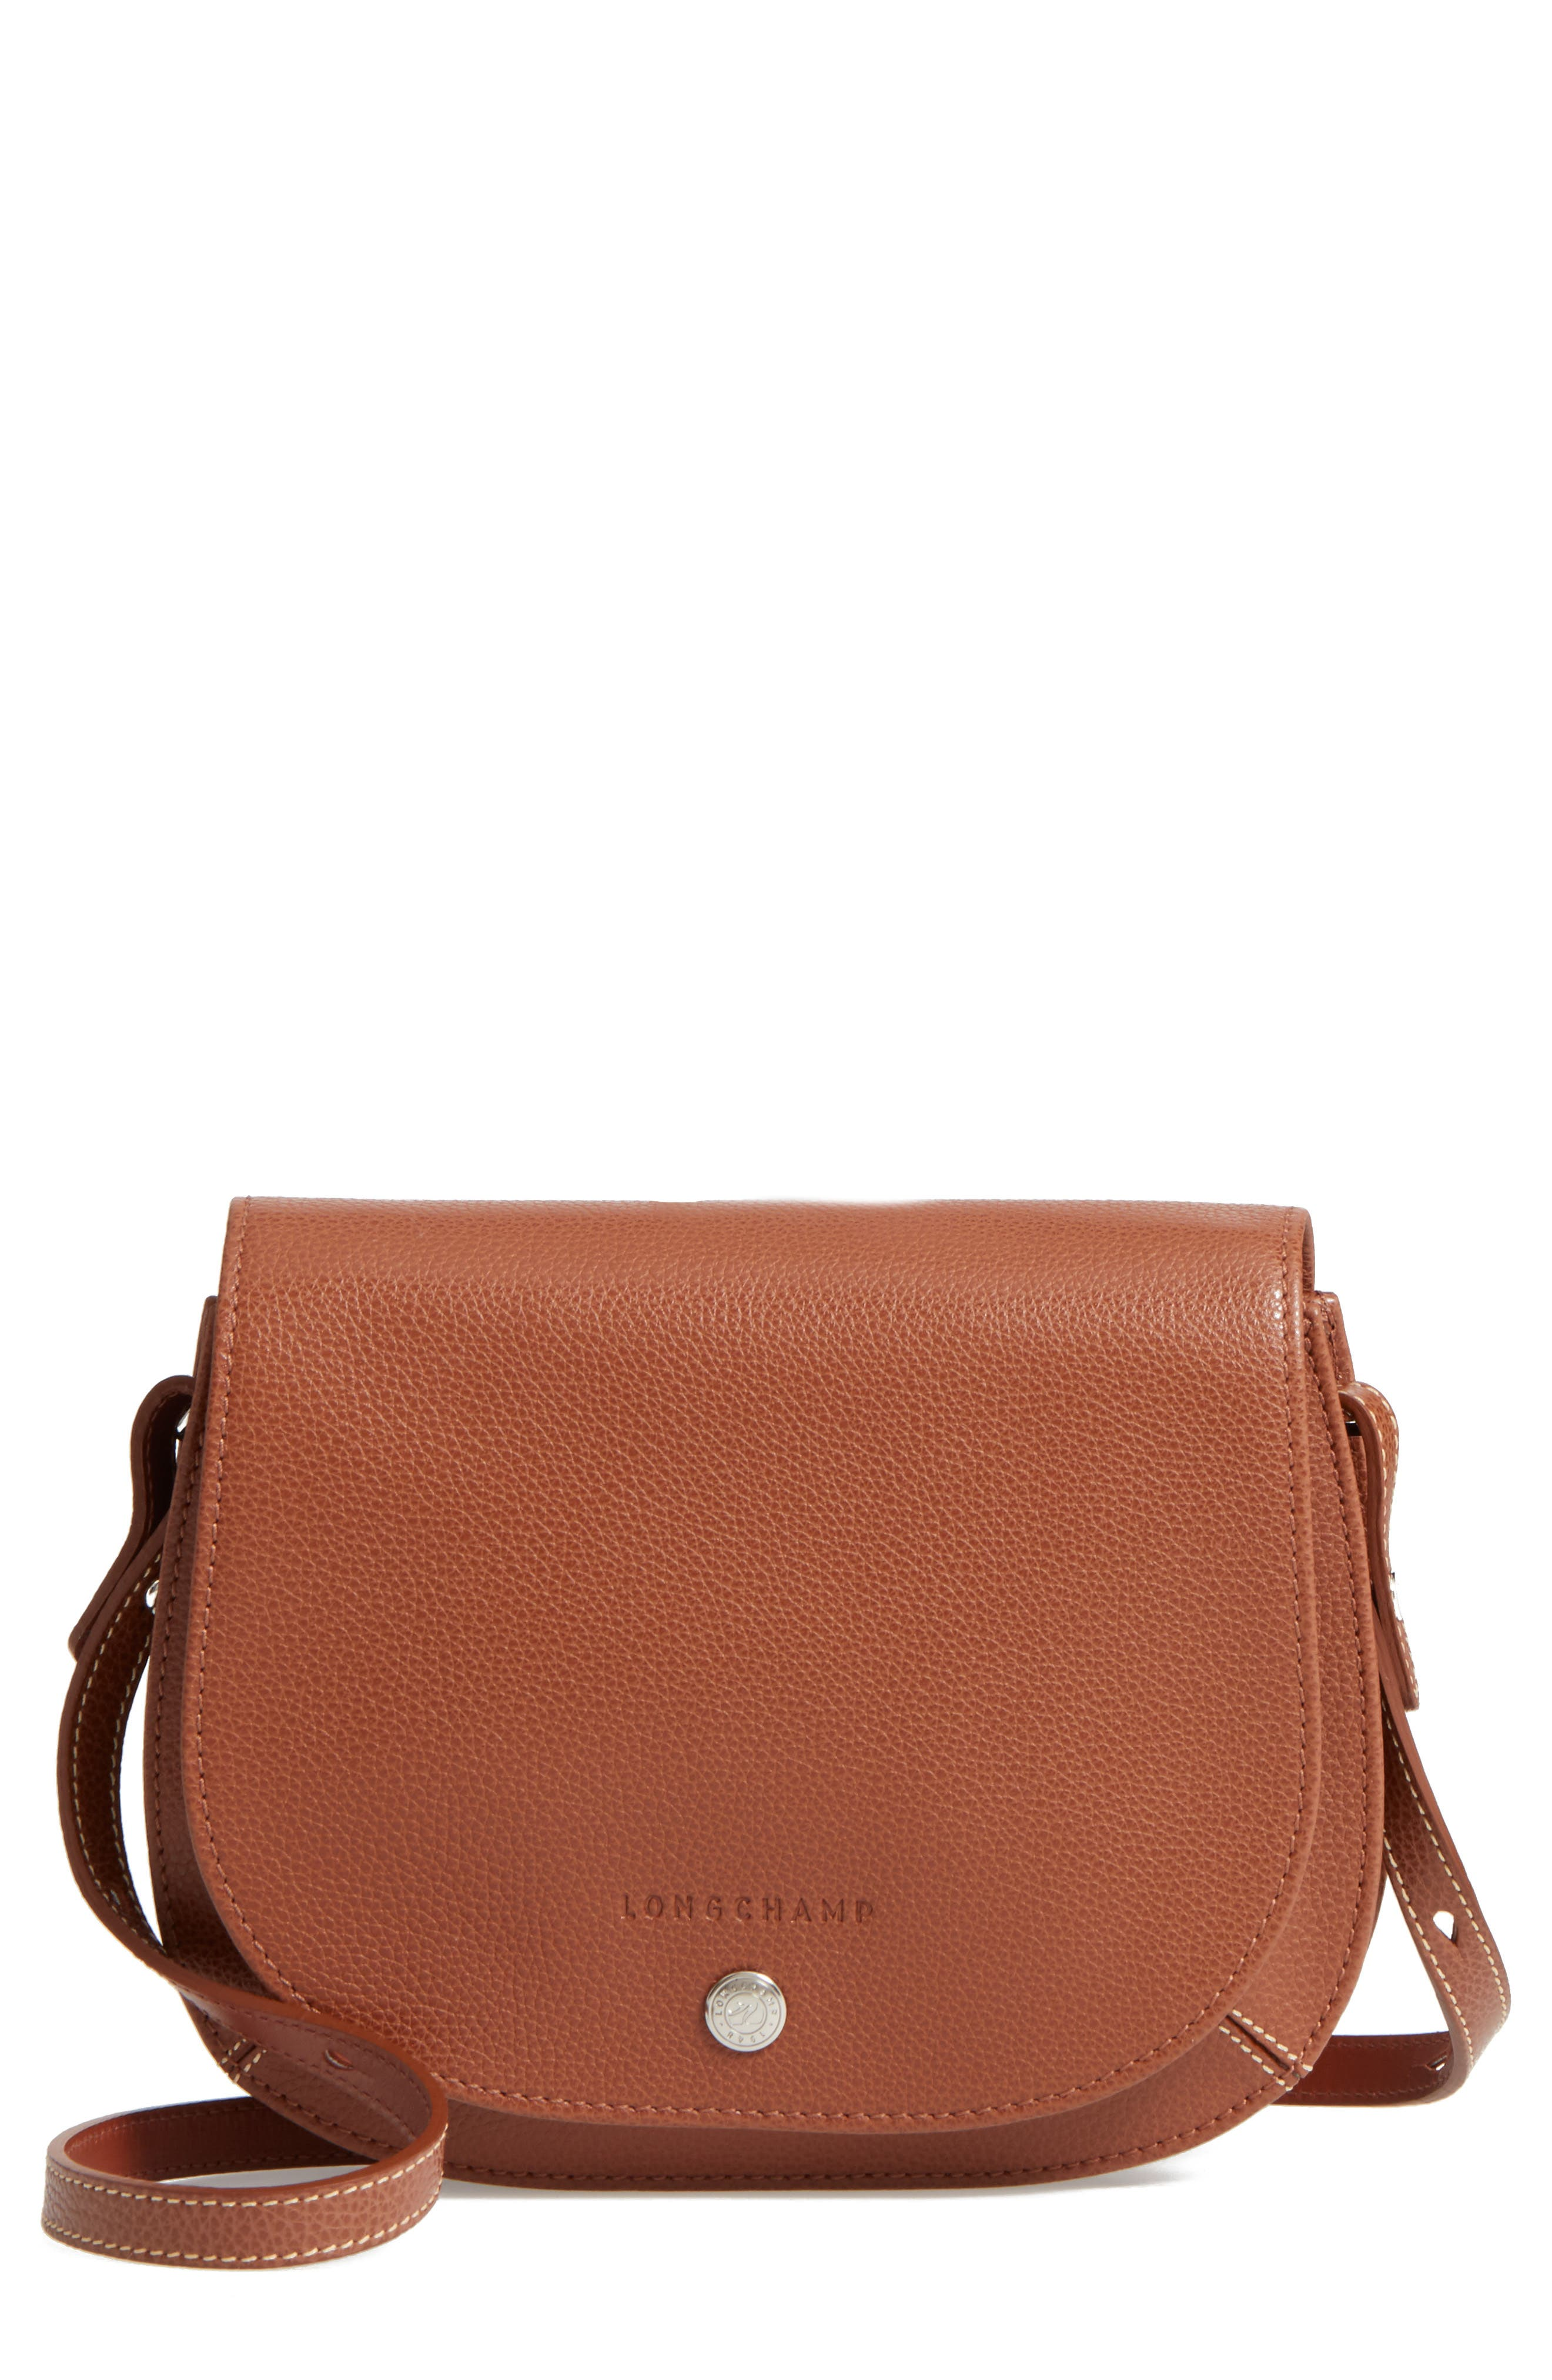 Main Image - Longchamp Small Le Foulonne Leather Crossbody Bag